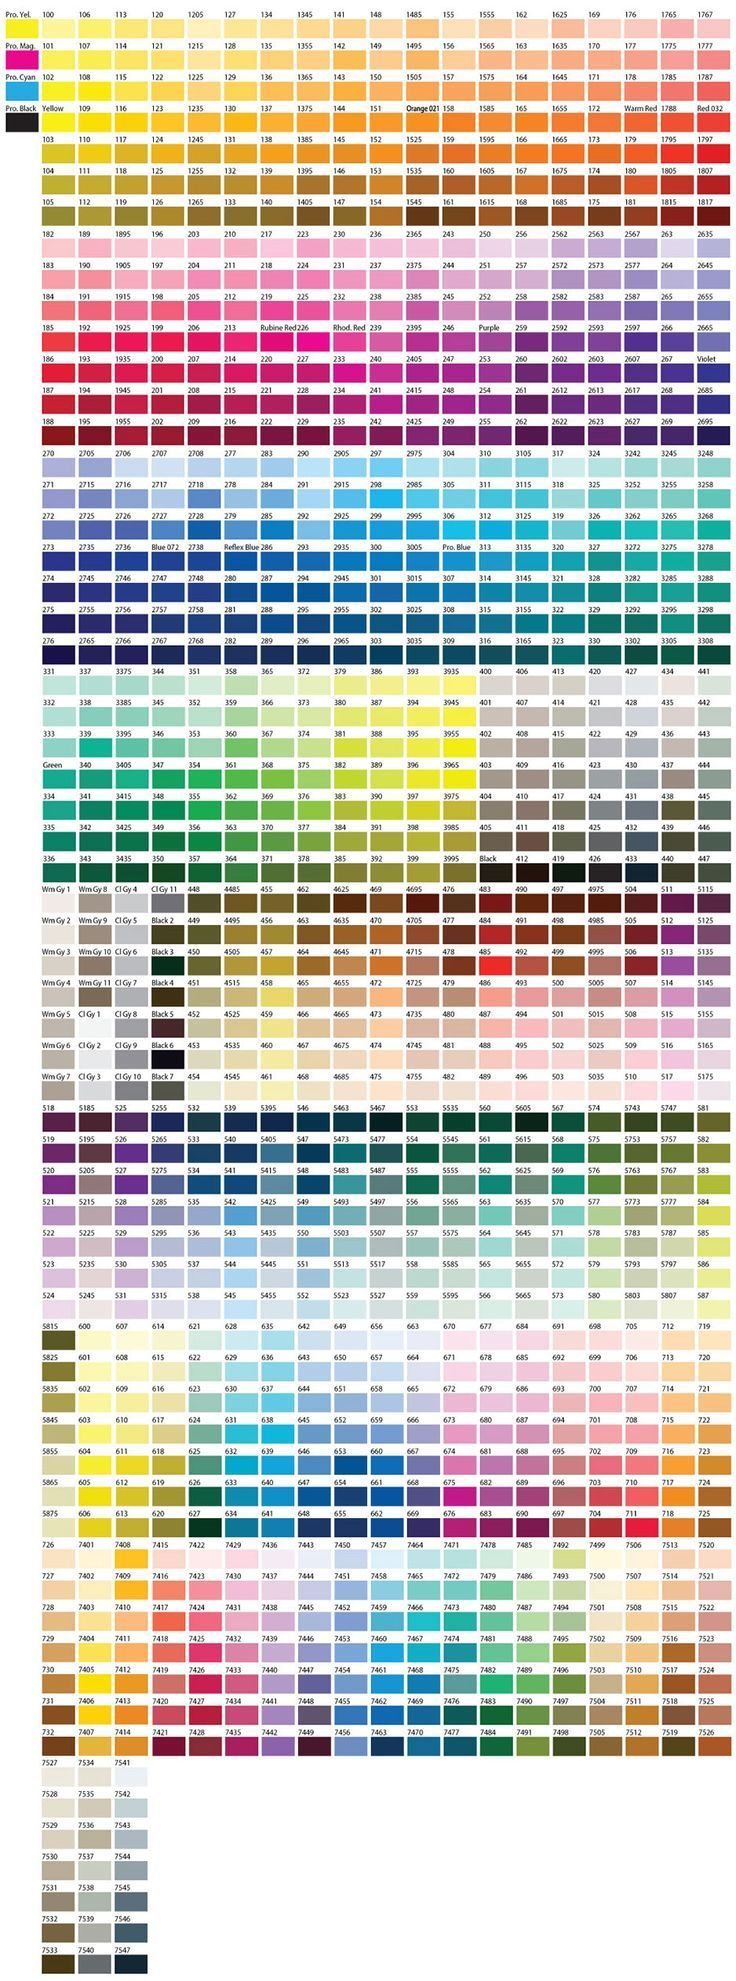 pantone color chart | Pantone color, Charts and Pantone ...